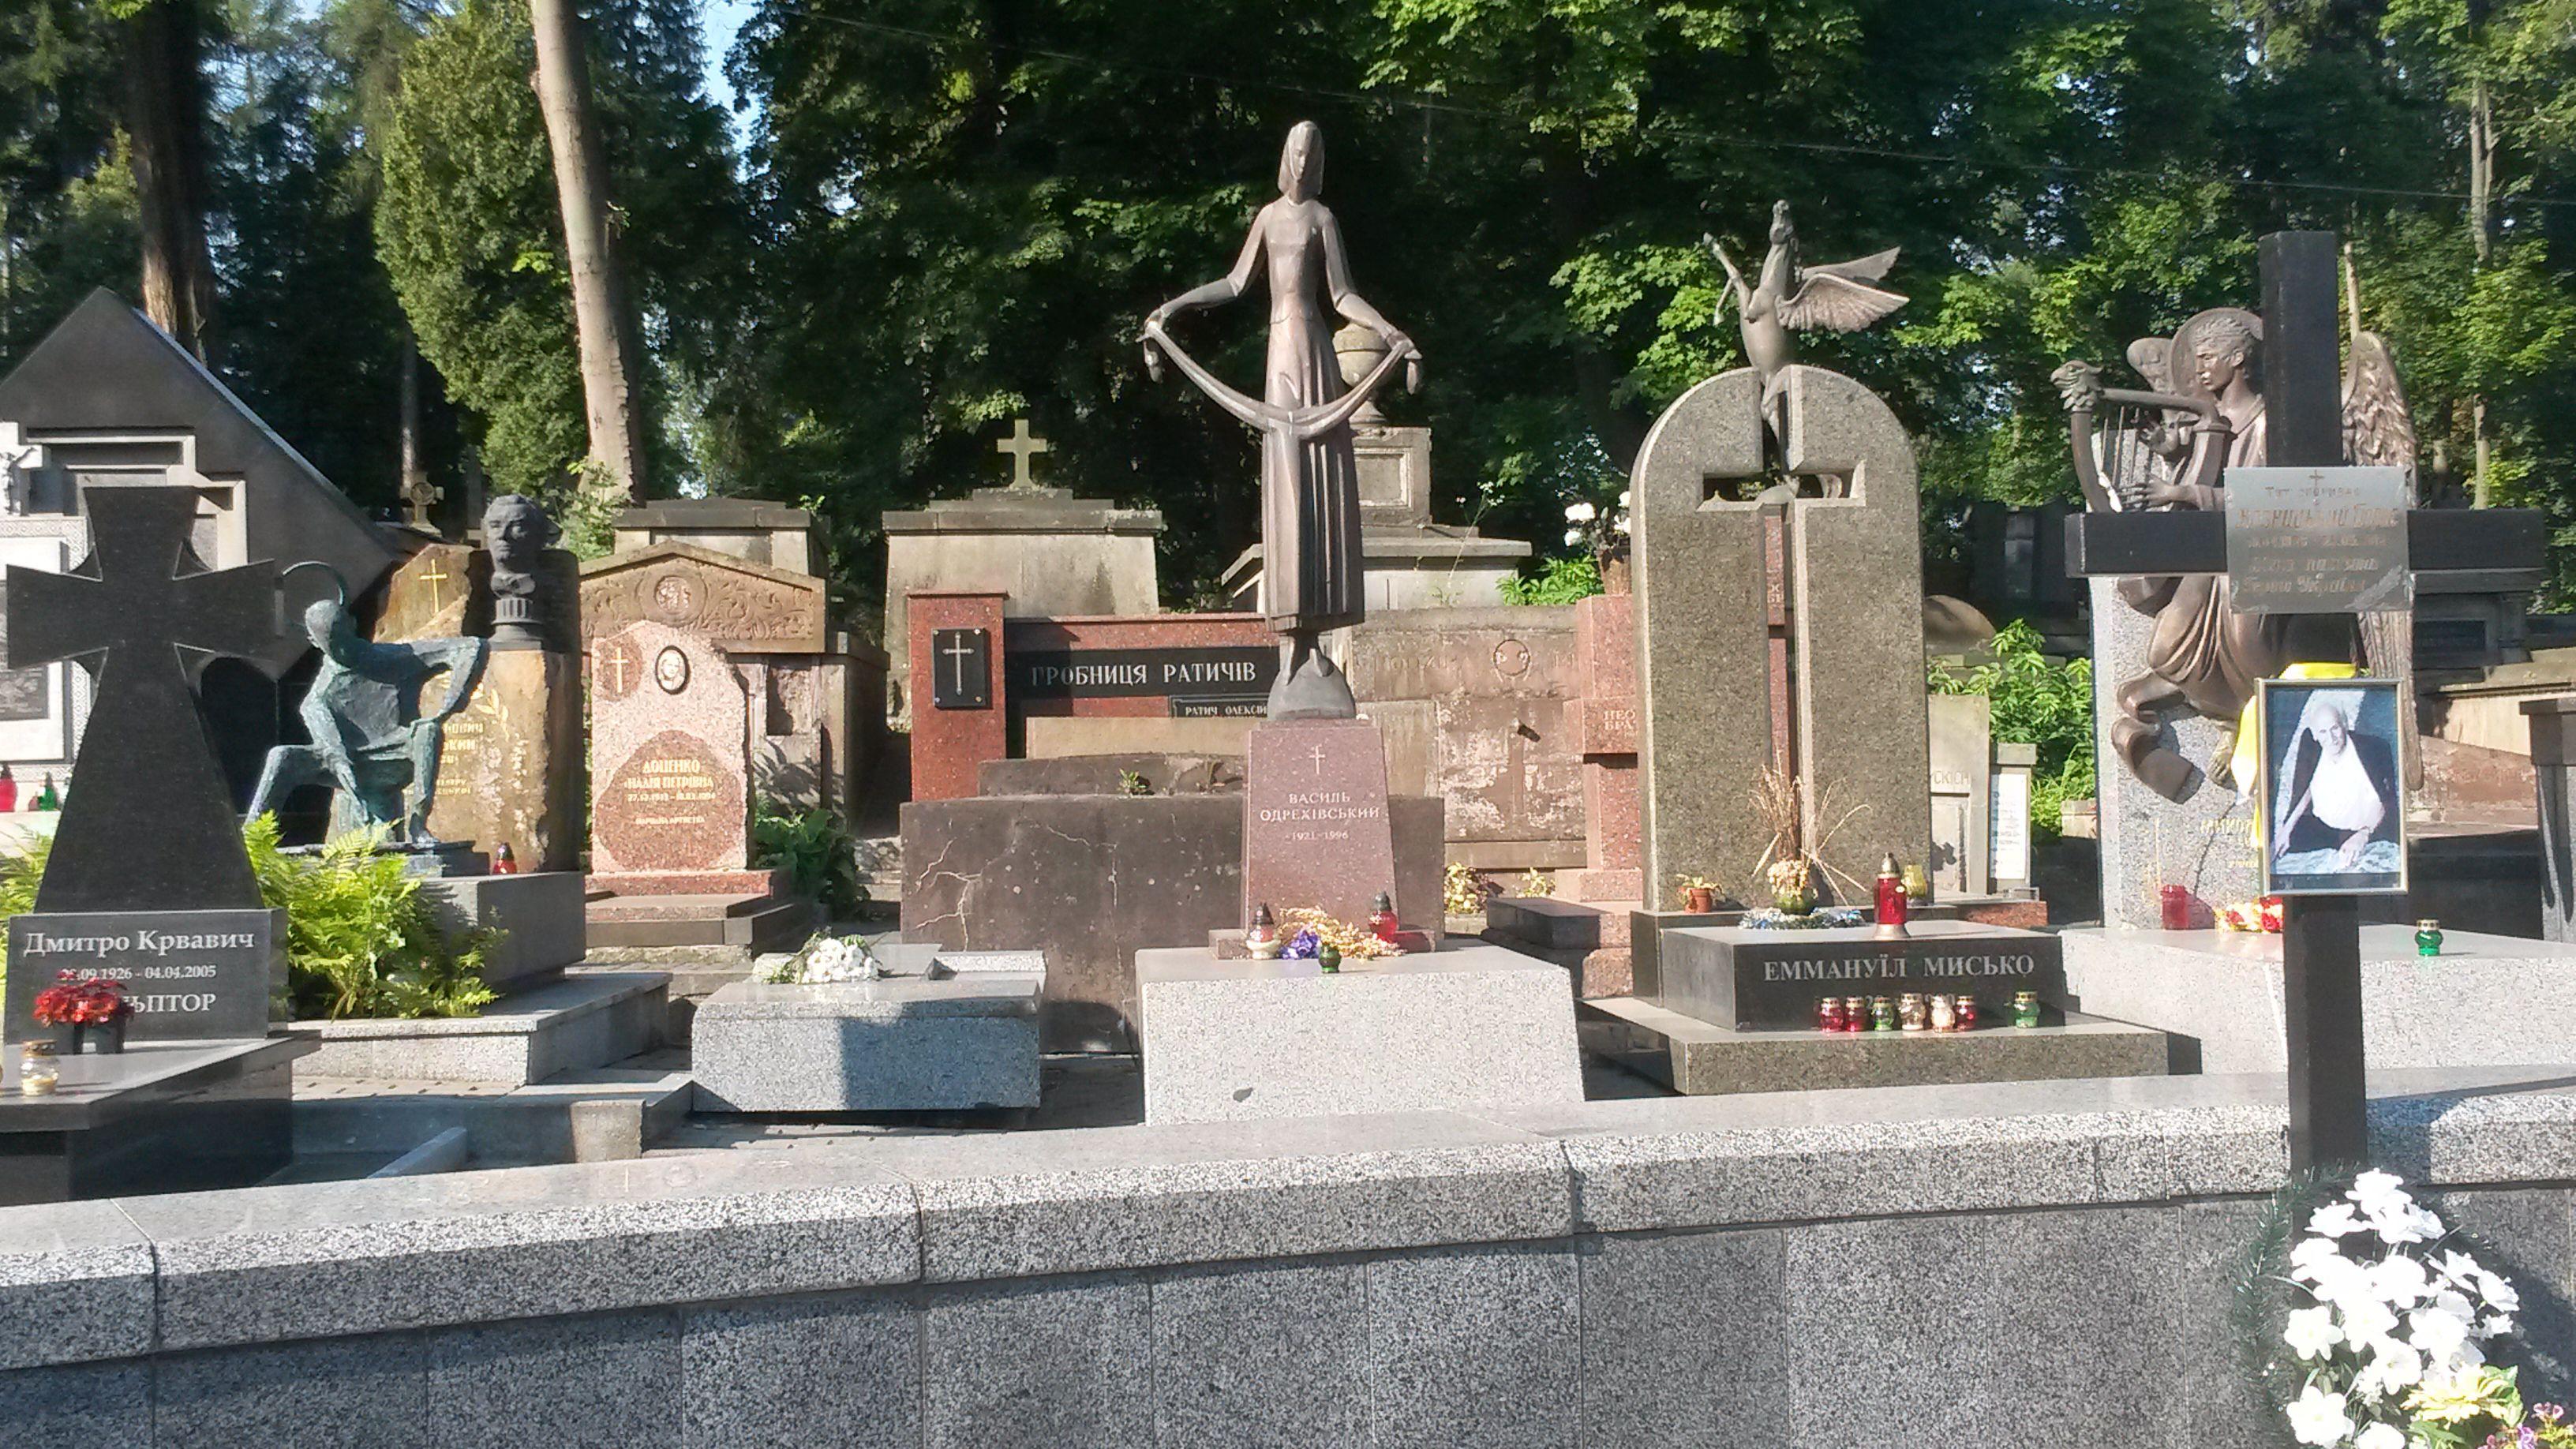 Lviv Lychakiv Mezarlığı